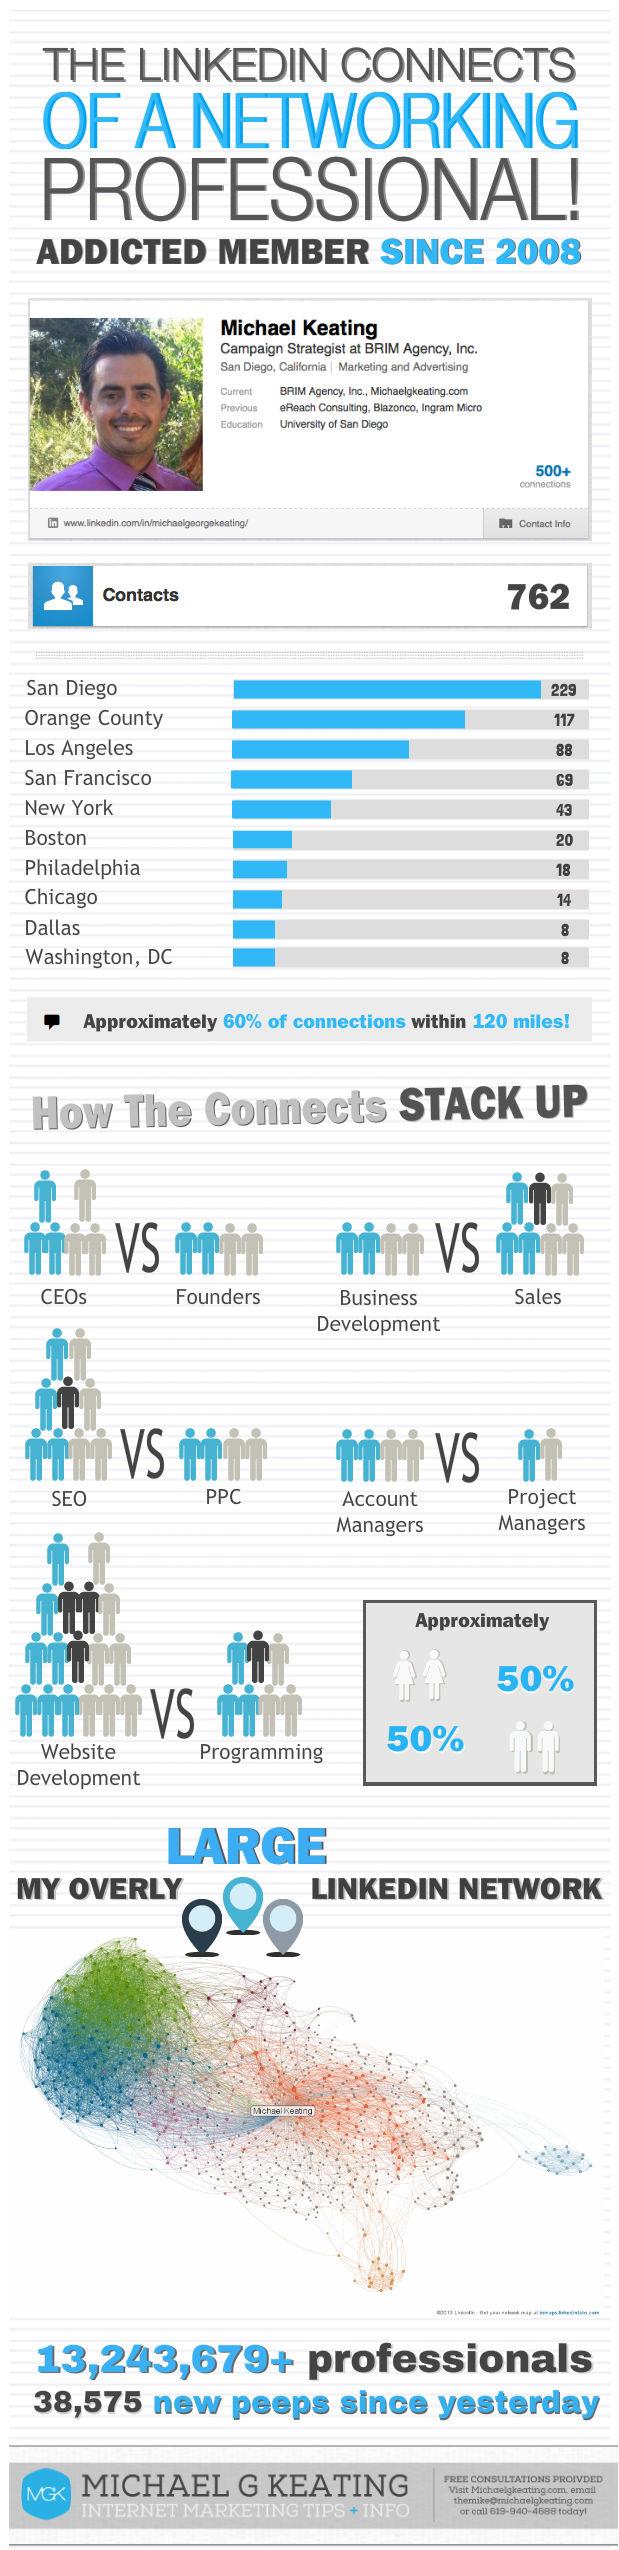 Michael G Keating Linkedin Infographic